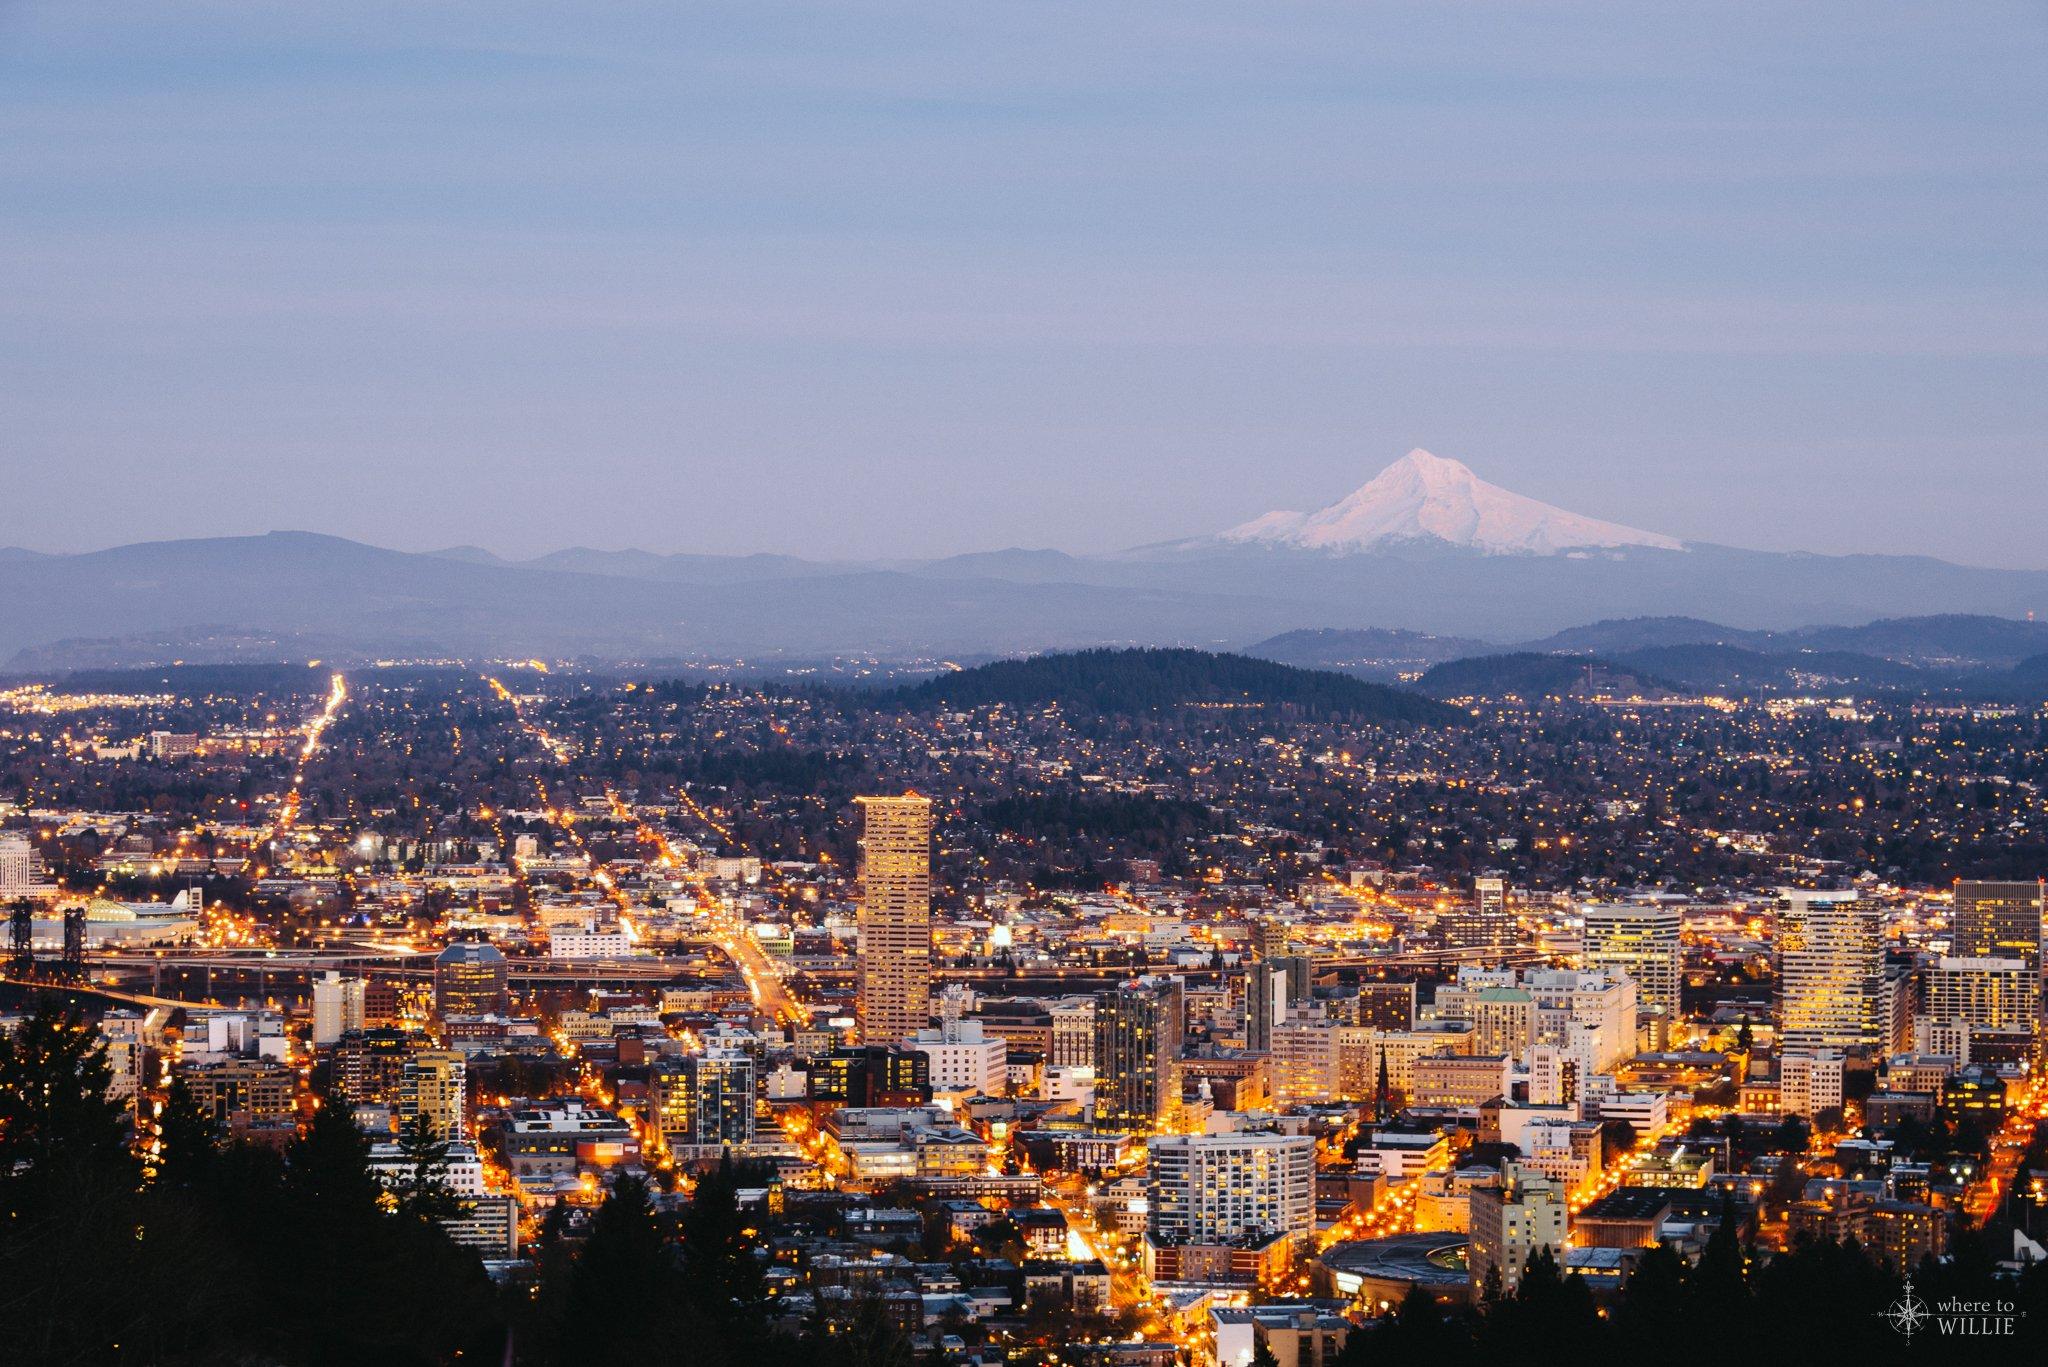 Portland Where To Willie